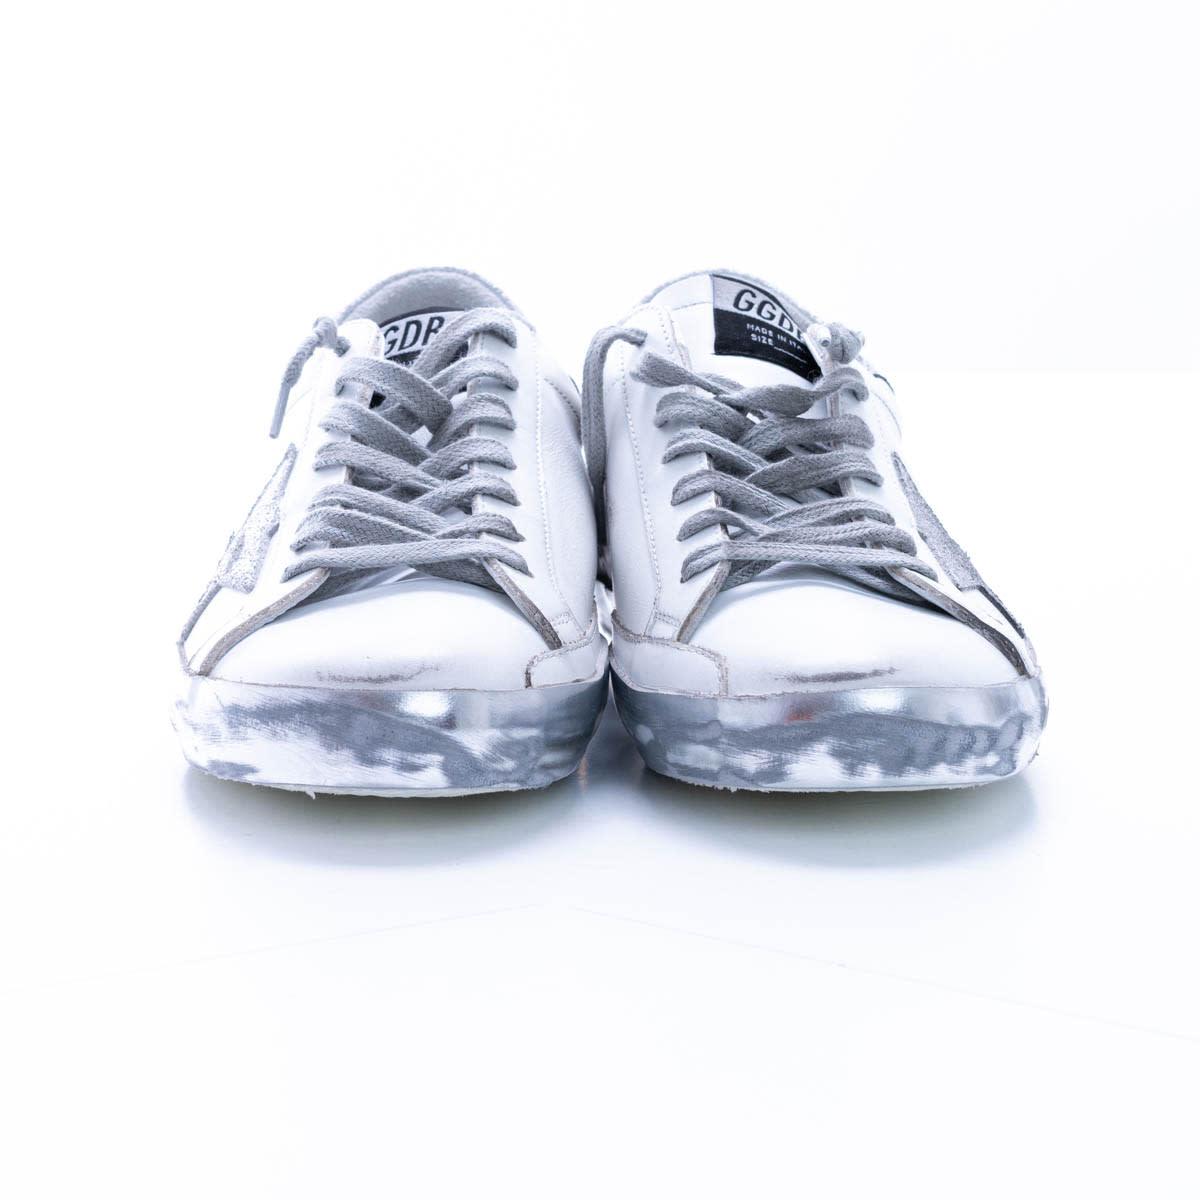 Golden Goose Super Star Leather Sneaker In White - Silver